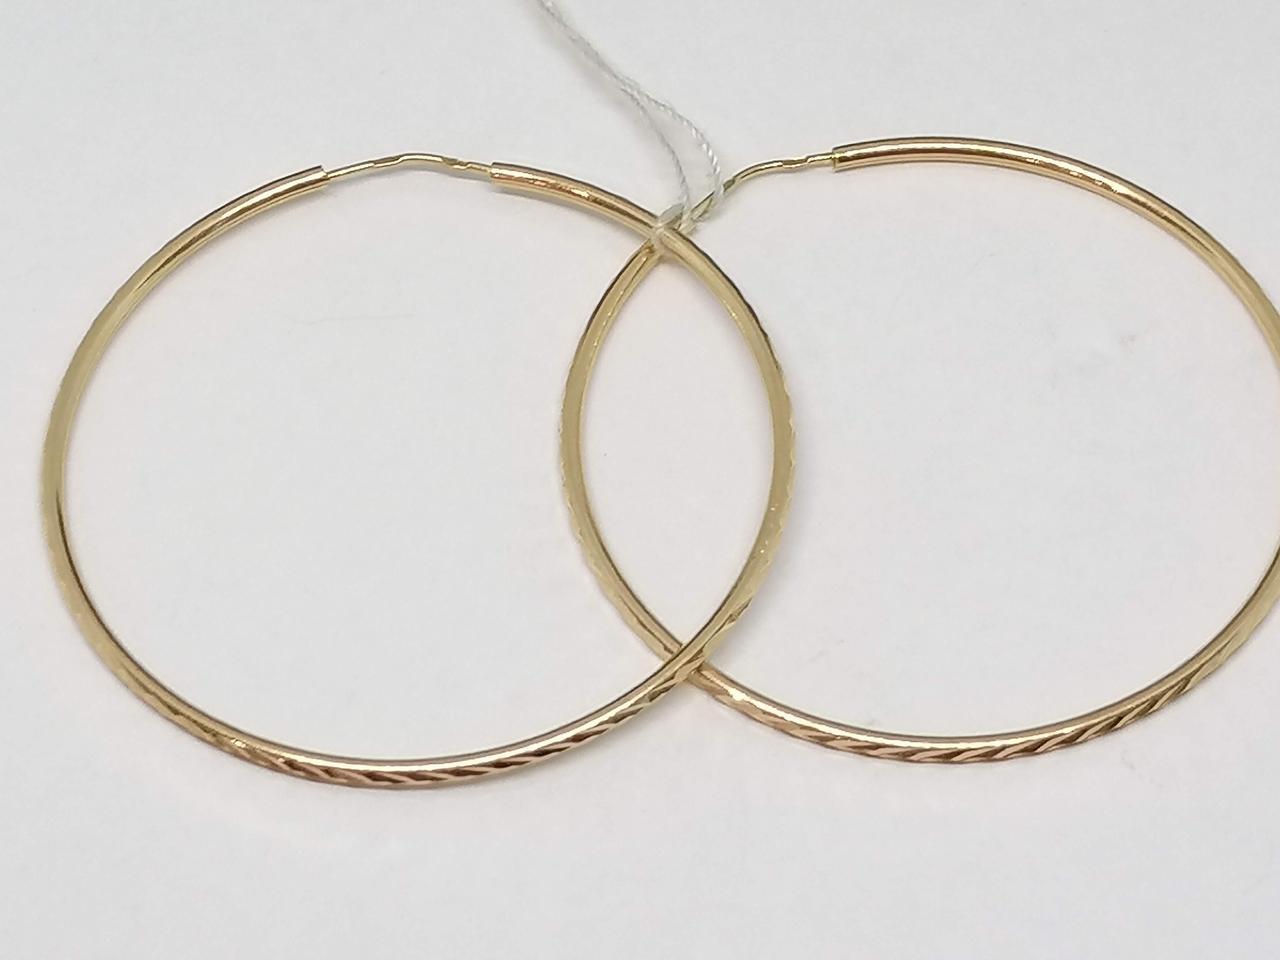 Золотые серьги. Артикул 100025